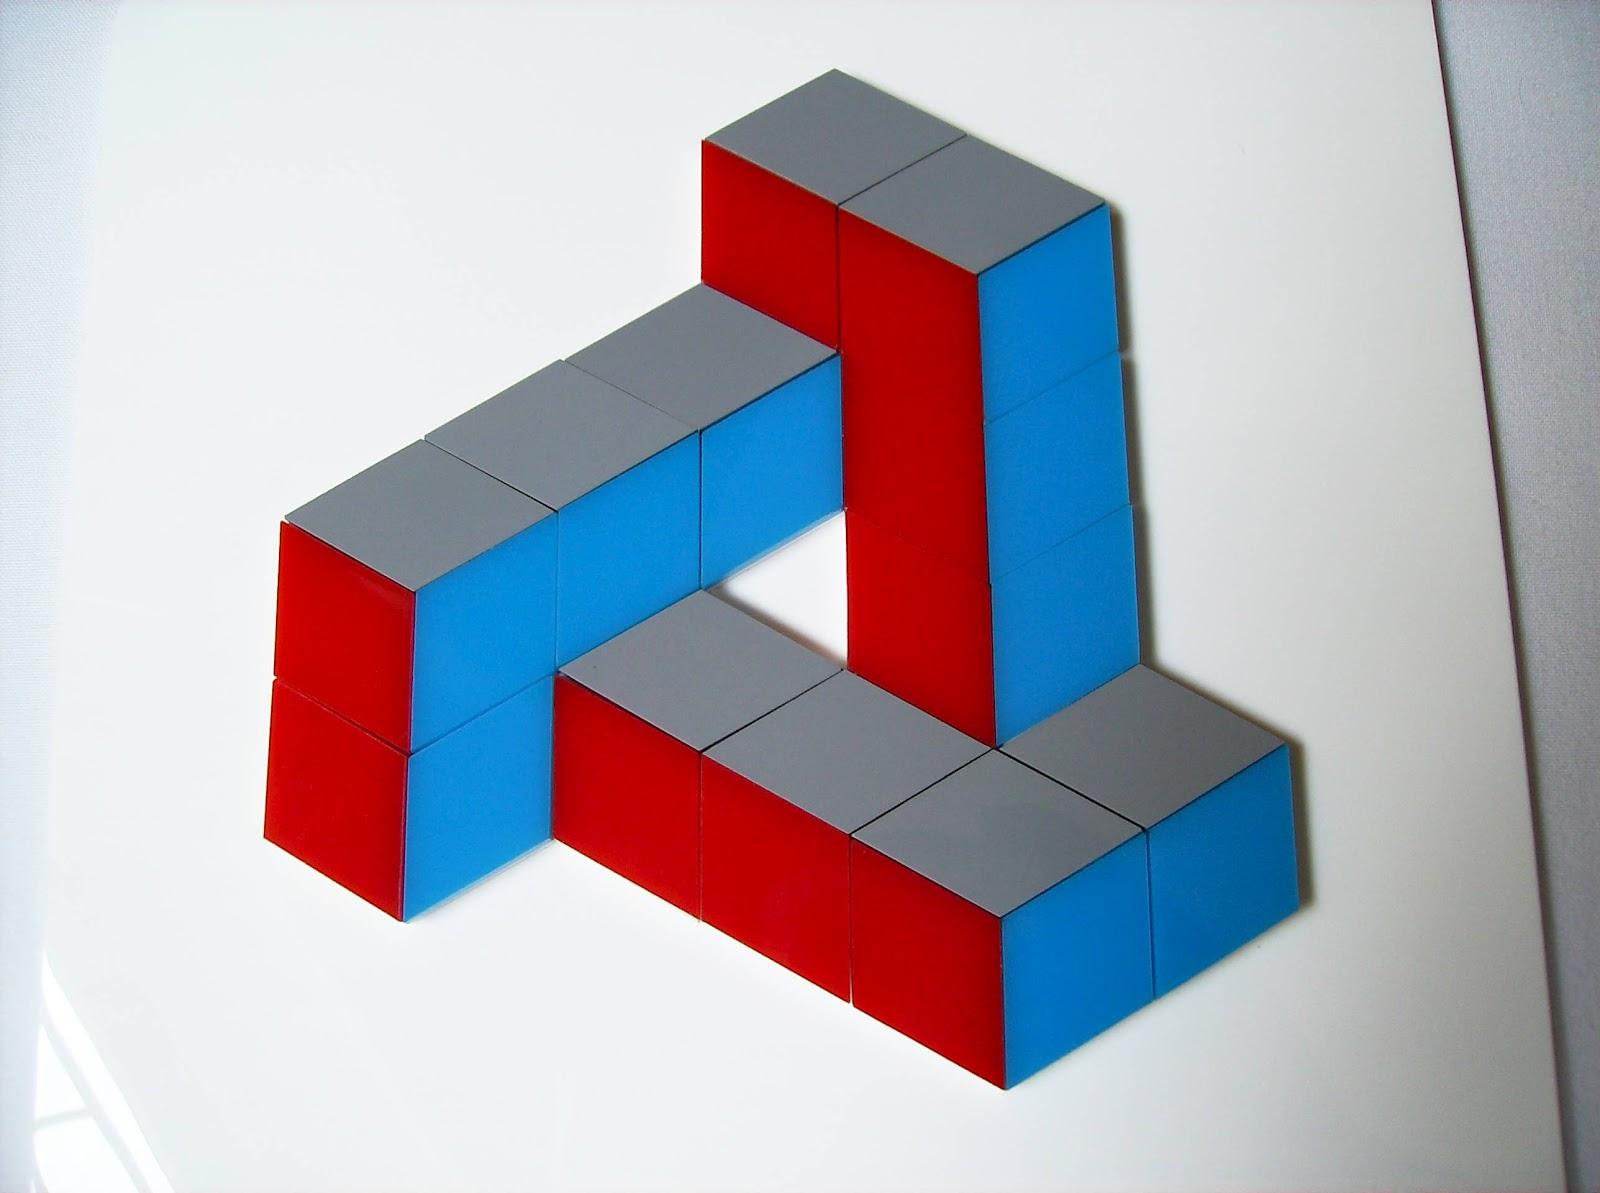 Drawn shapes To Using isometric isometric Rodillian